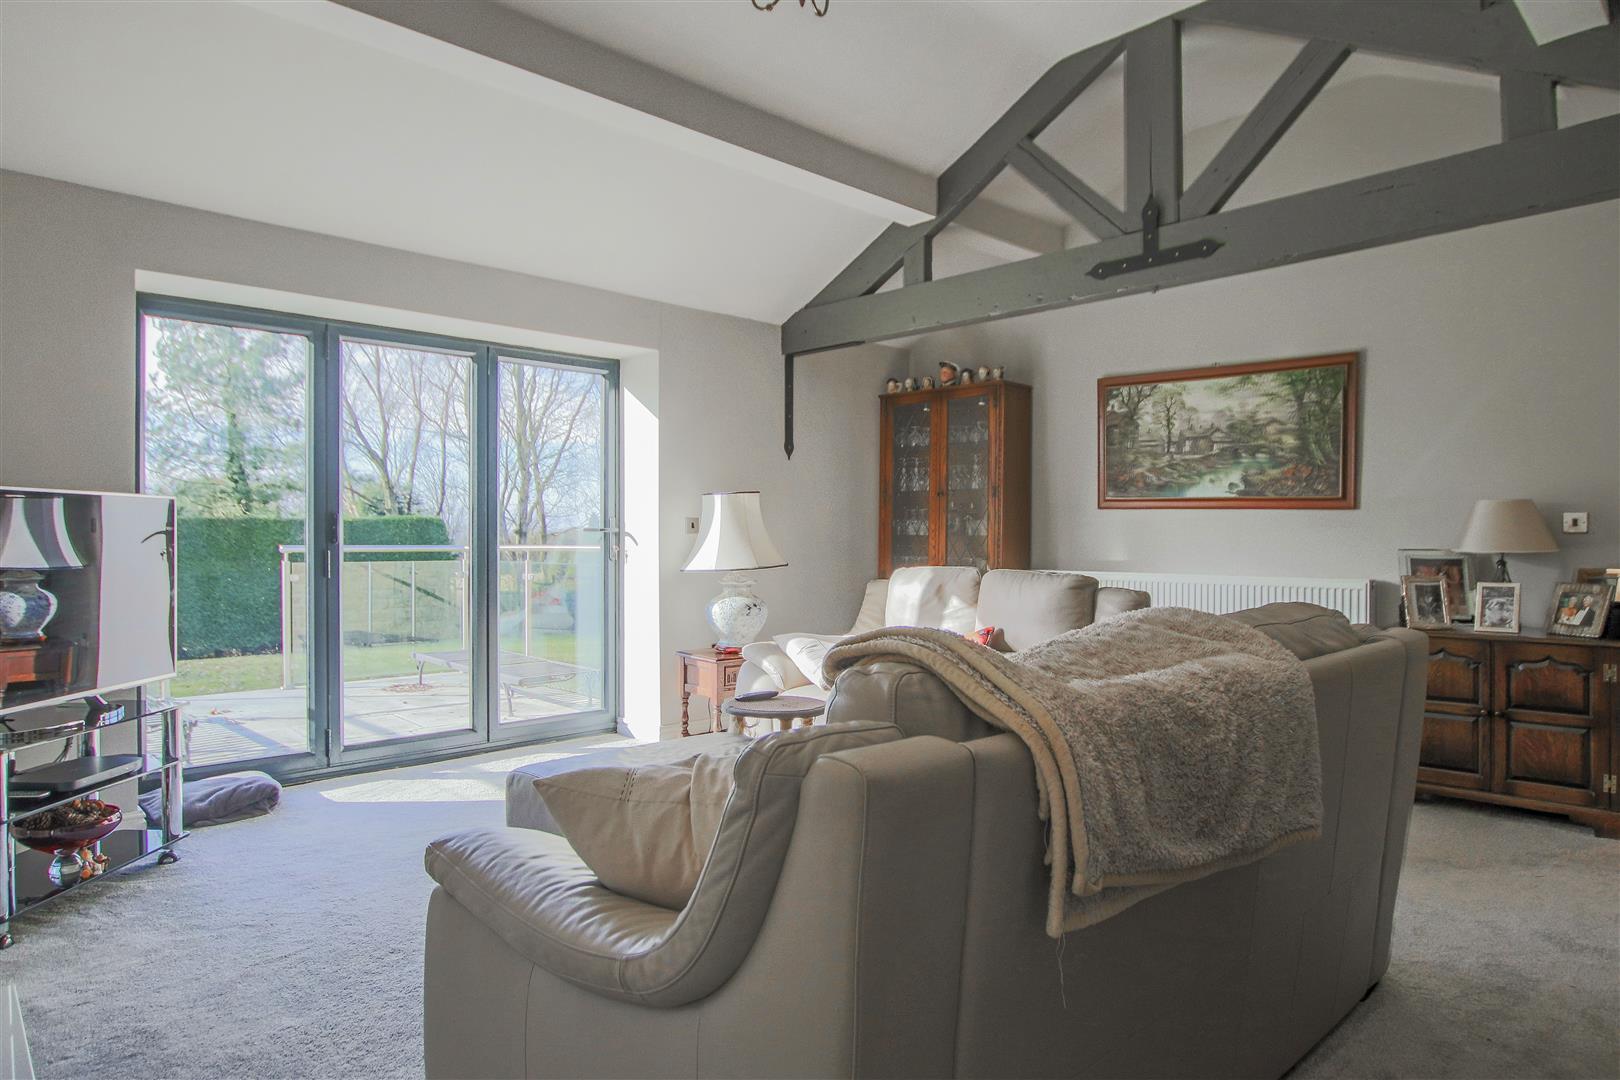 6 Bedroom Barn Conversion For Sale - 20.JPG